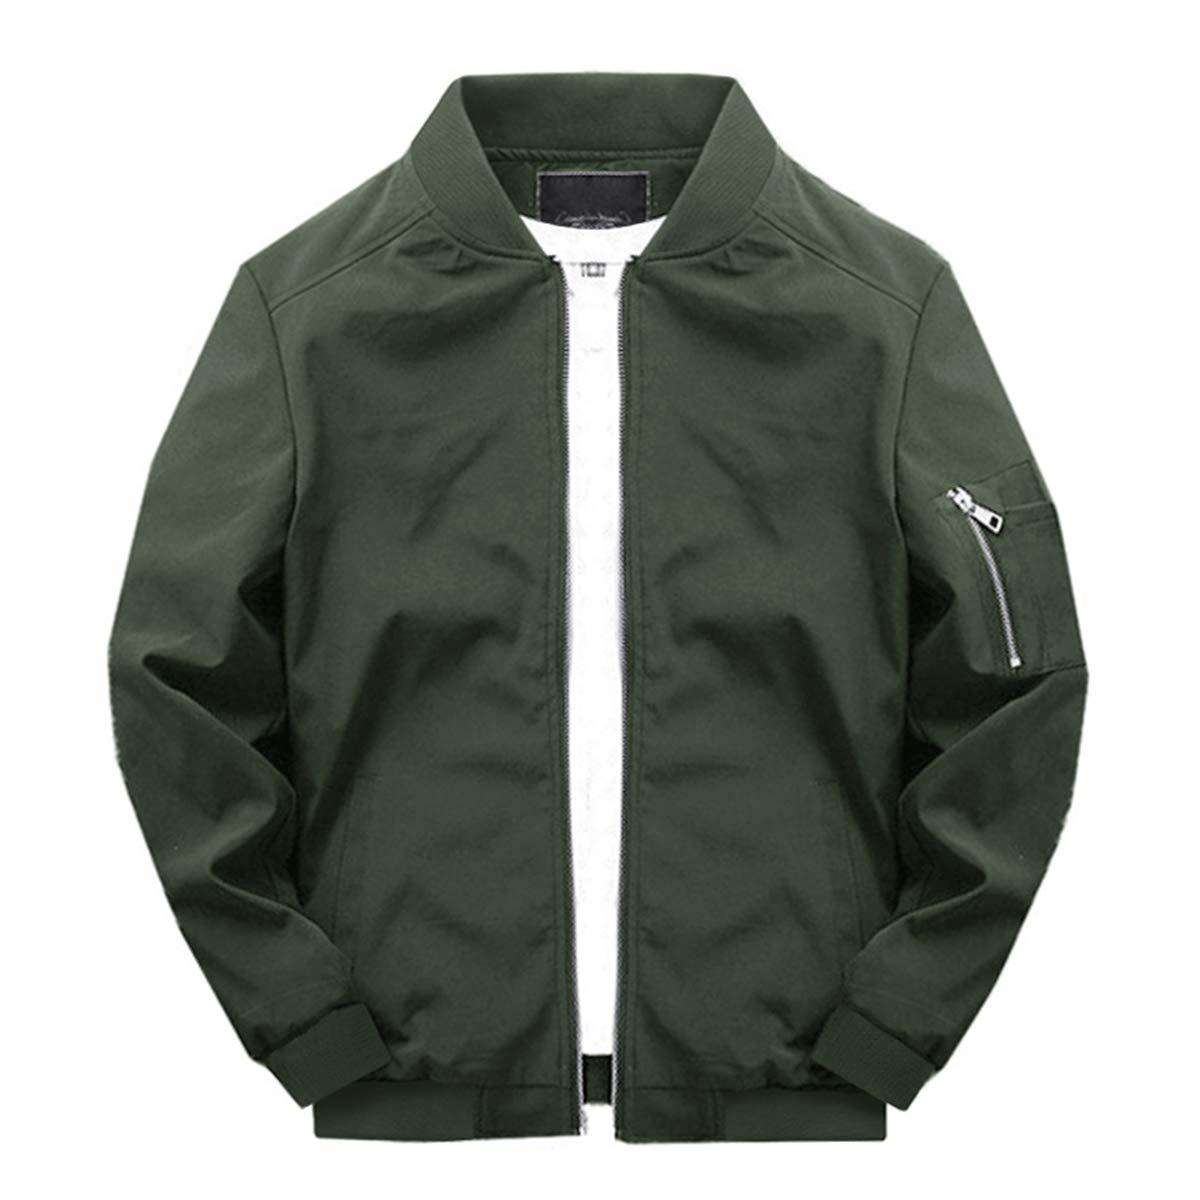 TOTNMC Men's Jacket Activewear Lightweight Softshell Flight Bomber Jacket Versity Coat Army Green by TOTNMC